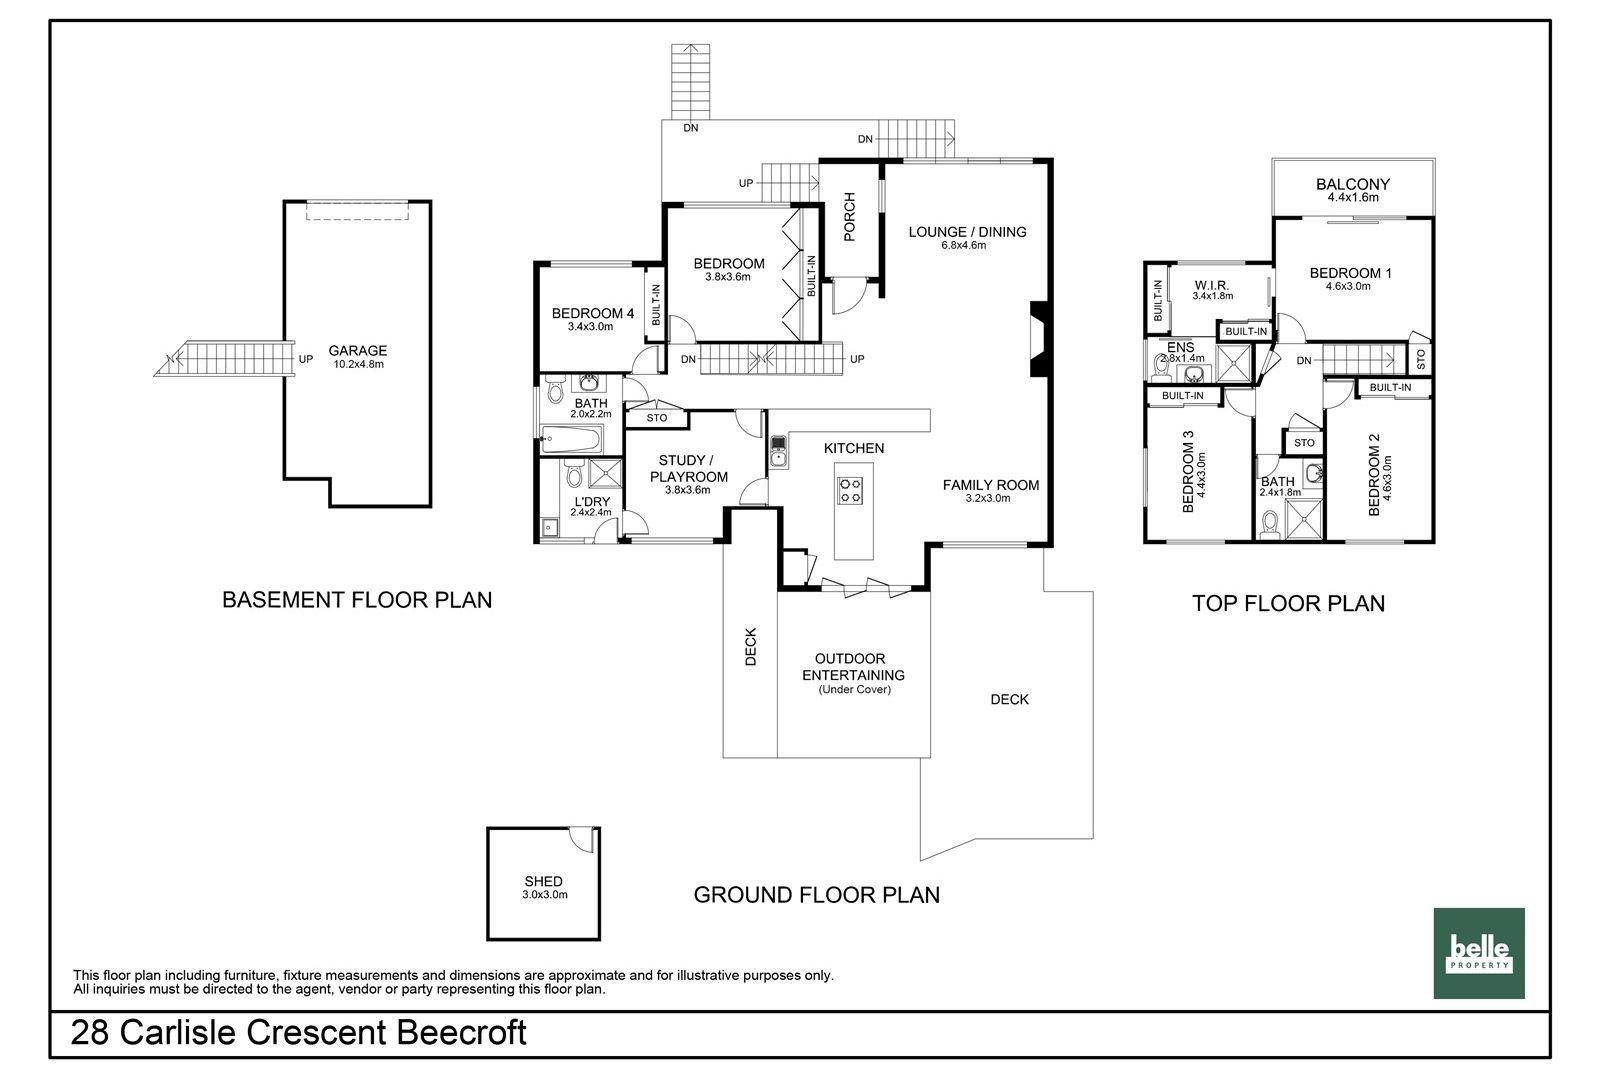 28 Carlisle Crescent, Beecroft NSW 2119, Image 9